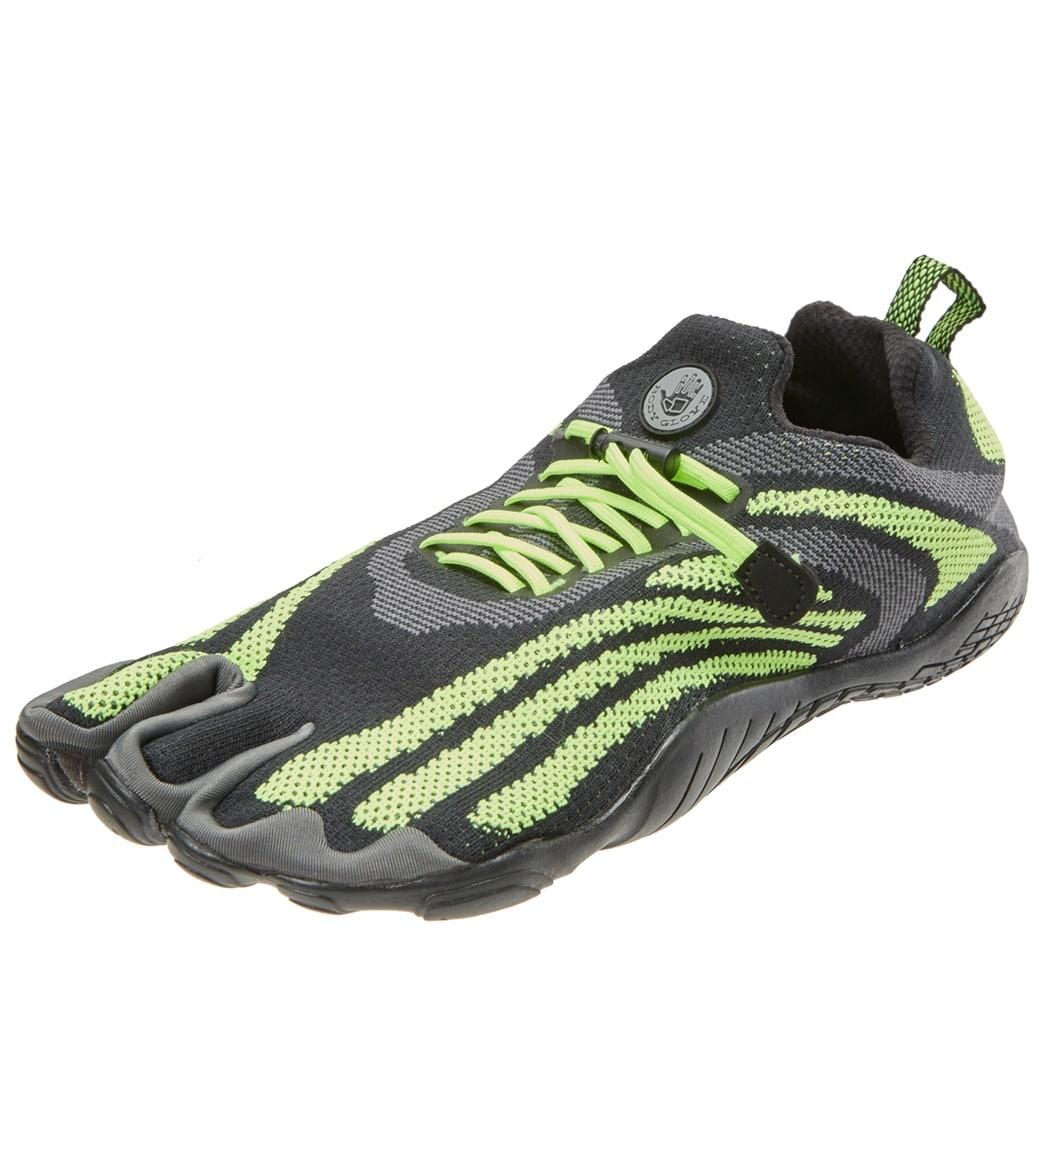 4040b71b0802 Body Glove Men s 3T Barefoot Requiem Water Shoe at SwimOutlet.com - Free  Shipping